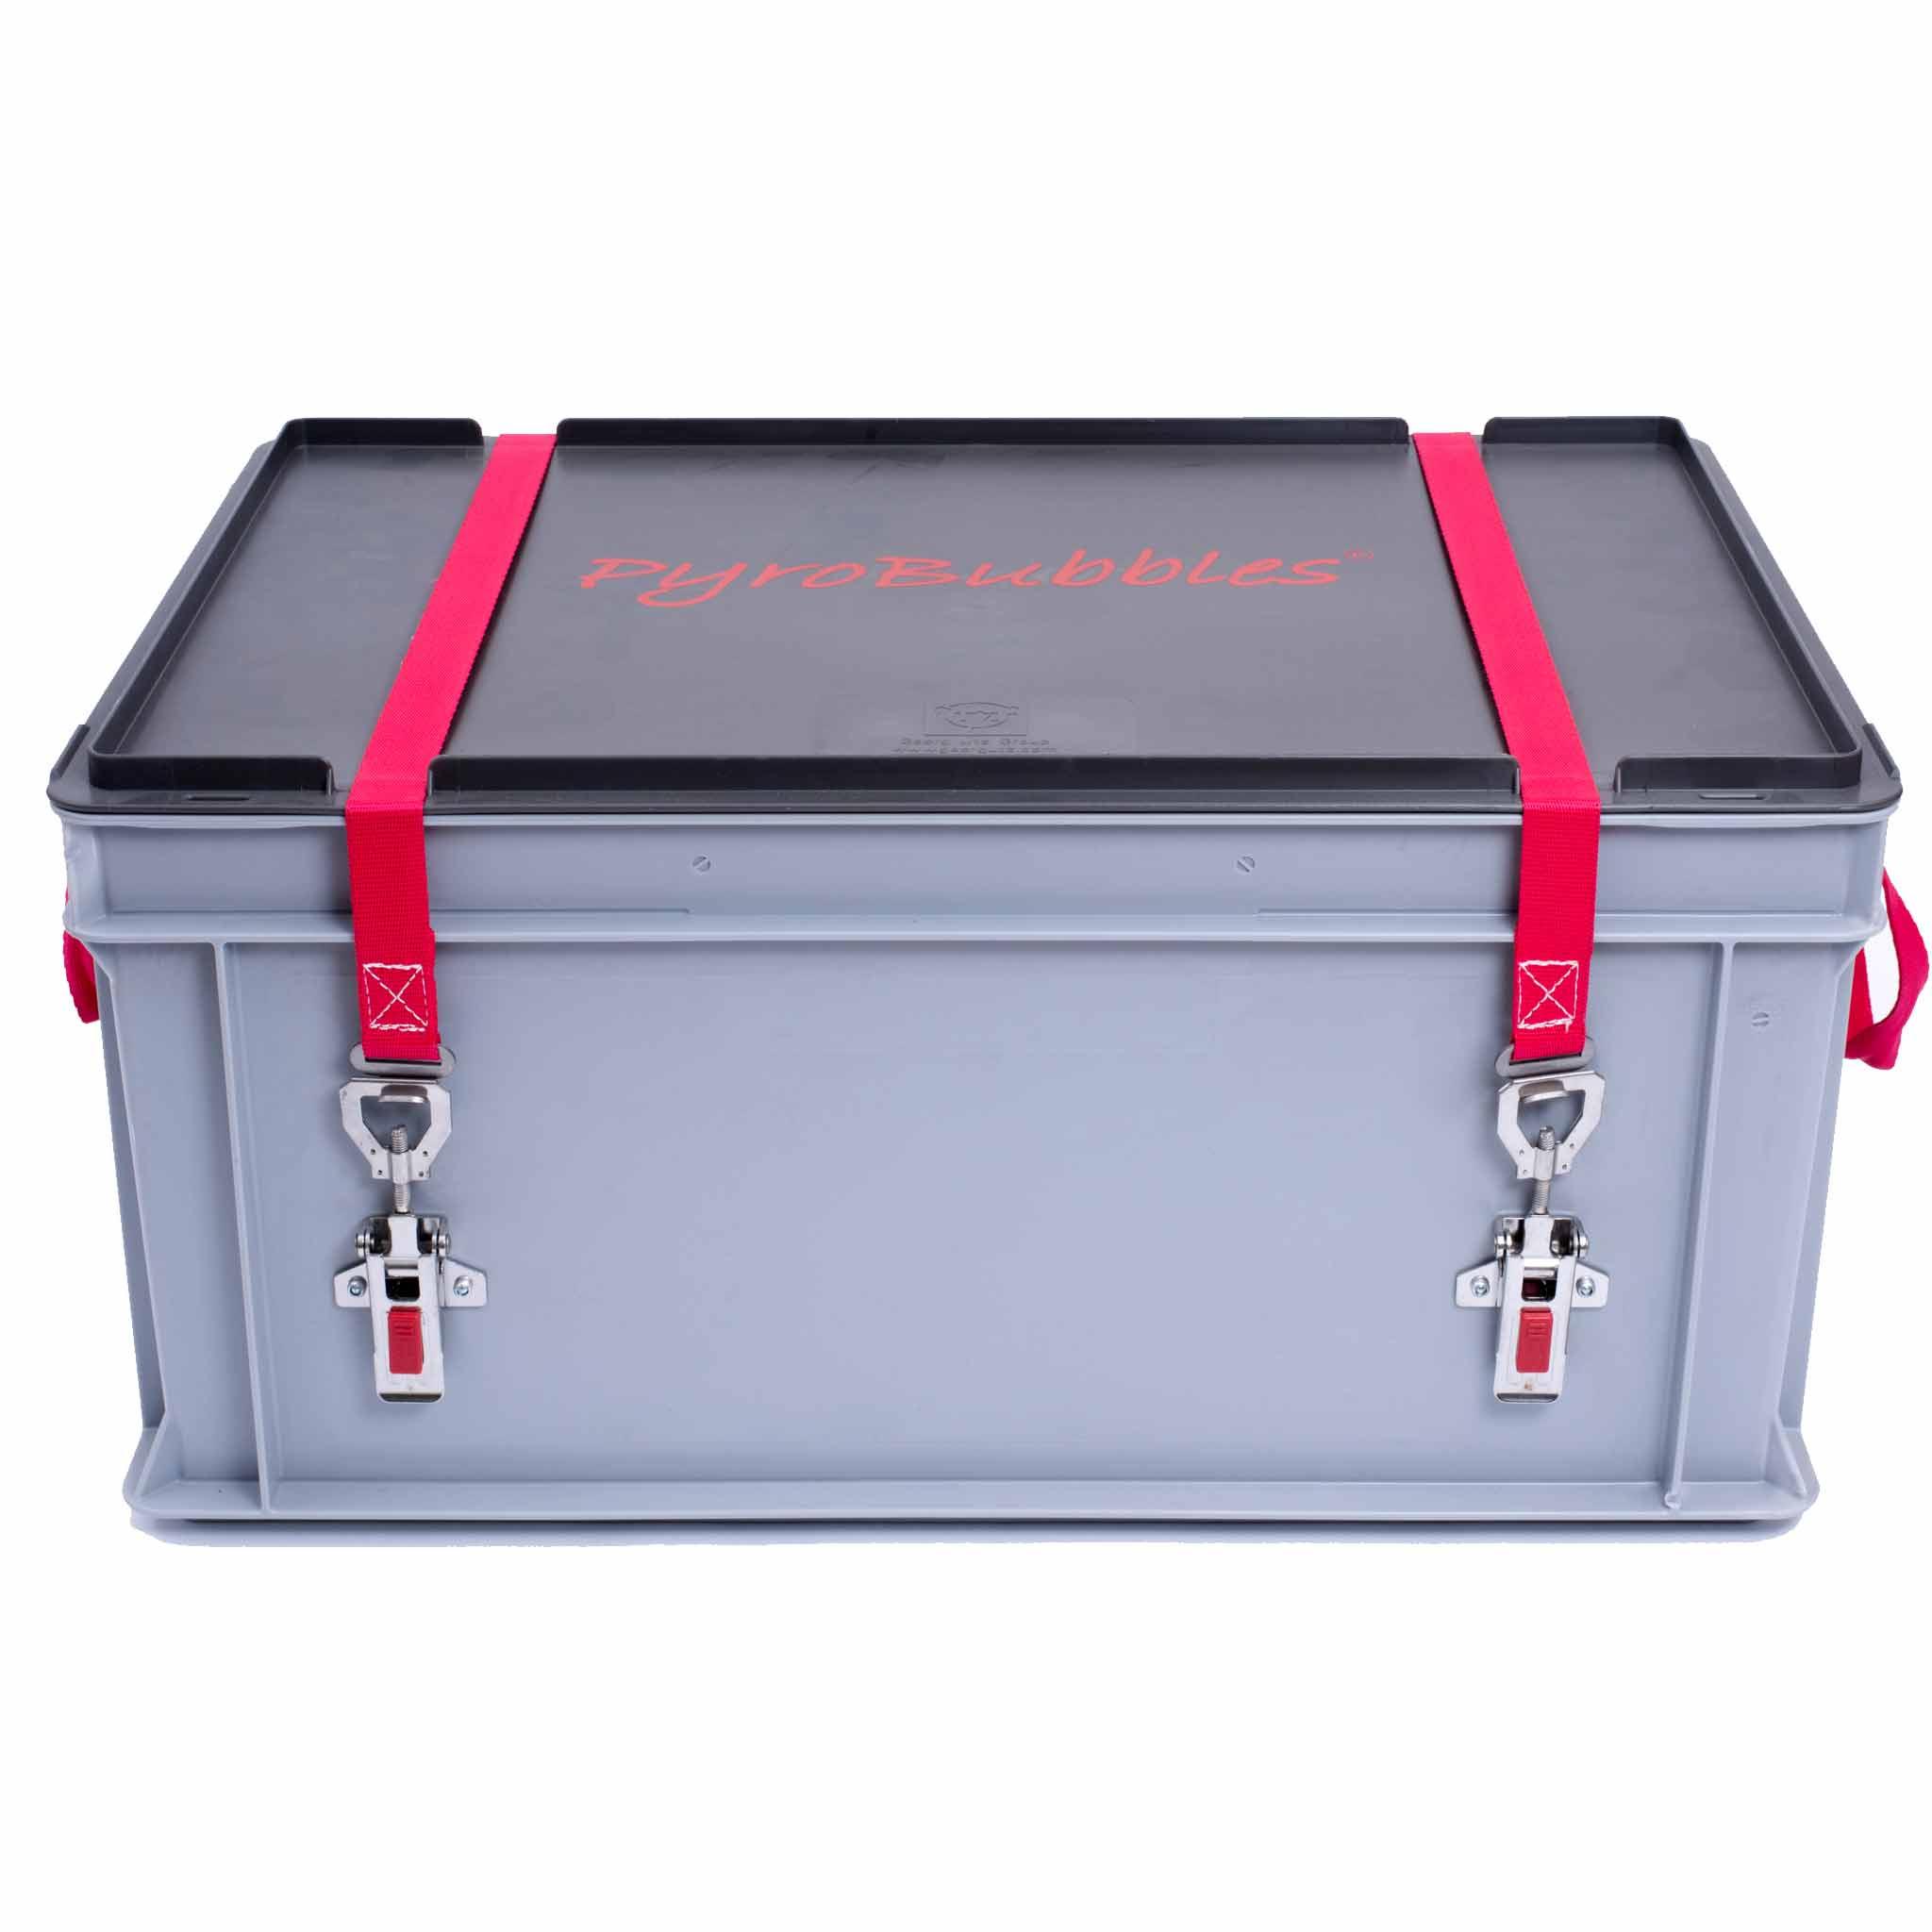 S-Box - 1 BASIC | 600 X 400 X 295 mm